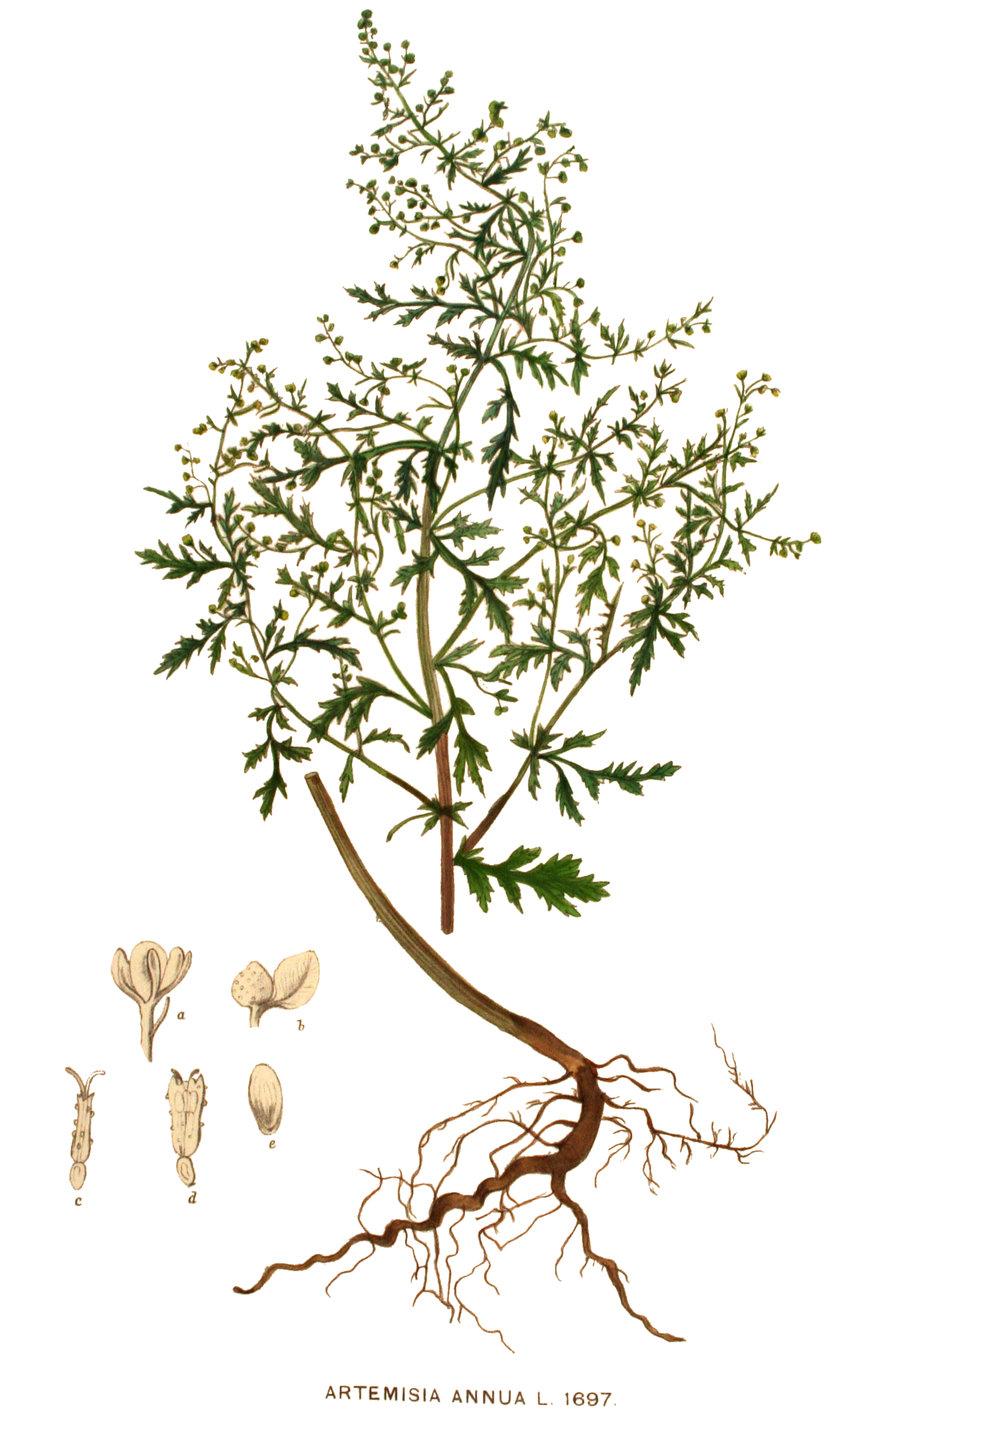 Artemisia annua.  Image: Oceancetaceen - Alice Chodura [Public domain], via Wikimedia Commons